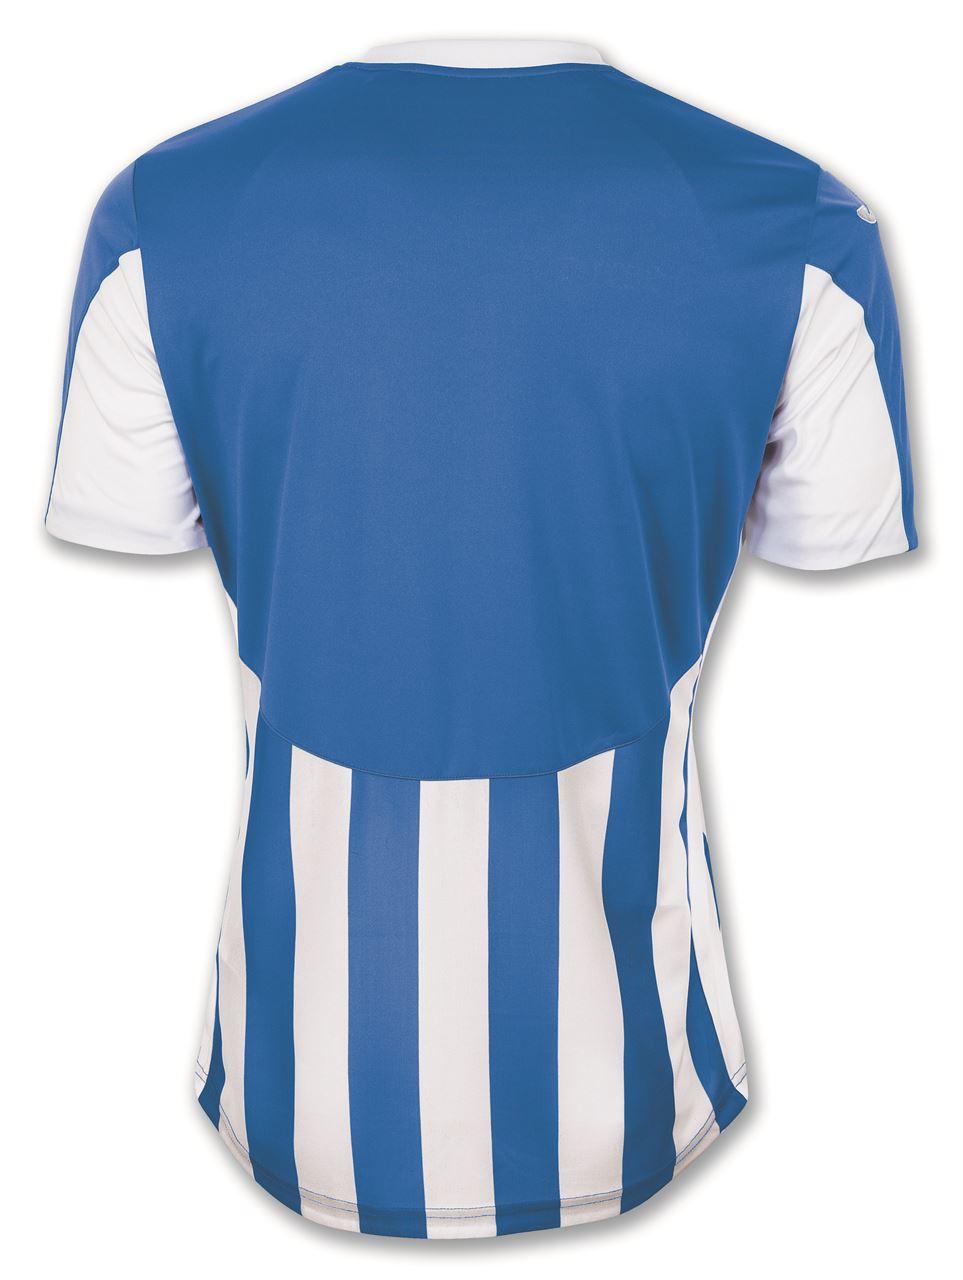 Joma Copa S/S Junior Football Shirt - 100001